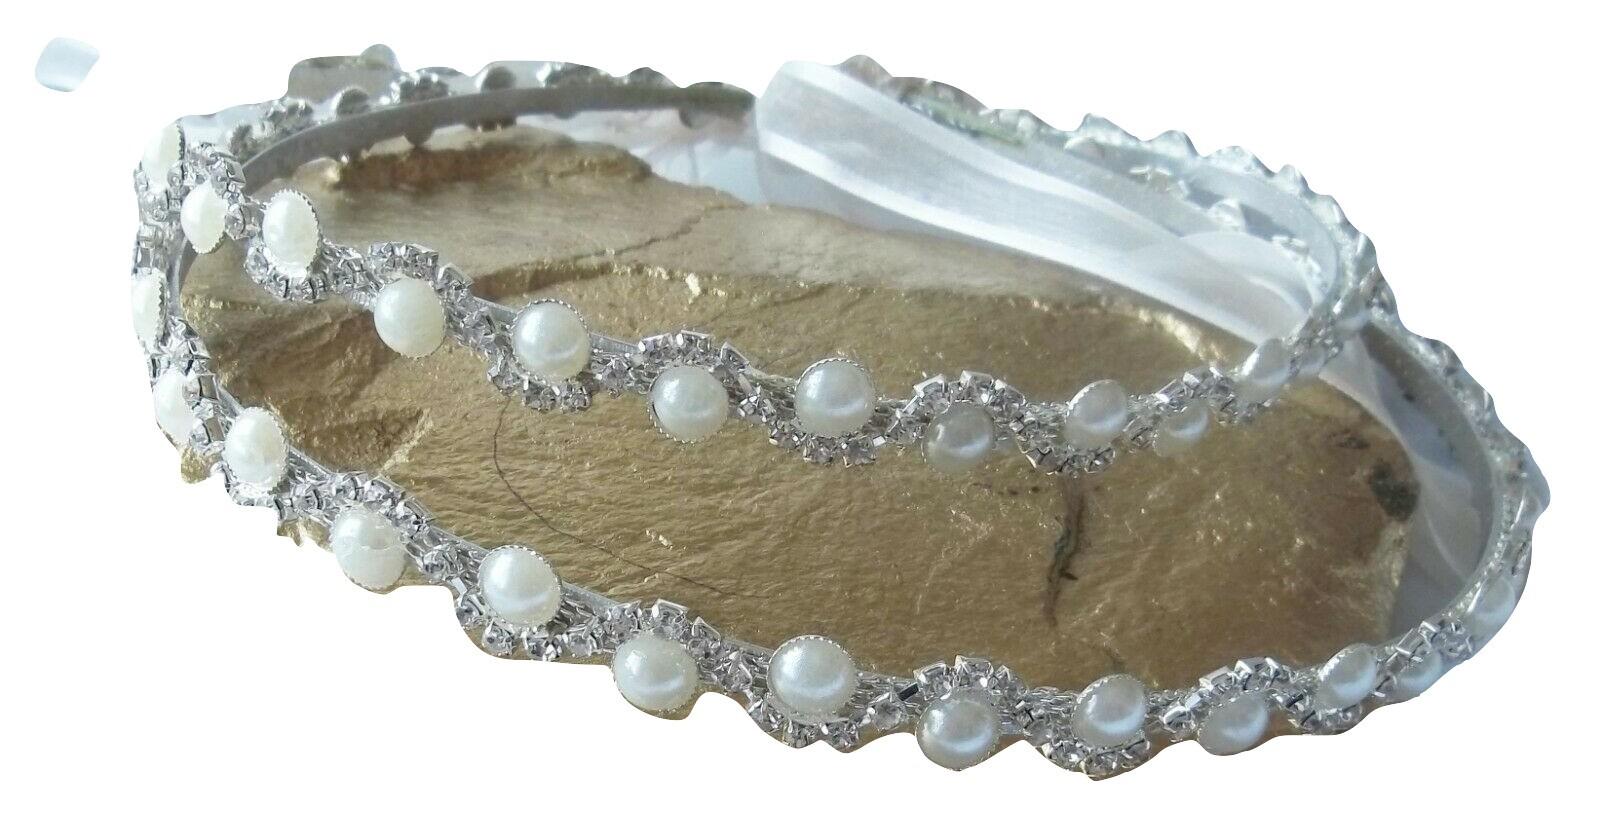 STEFANA Greek crowns Handmade White or Ivory Orthodox Wedding  Crowns  Stephana  Tiaras